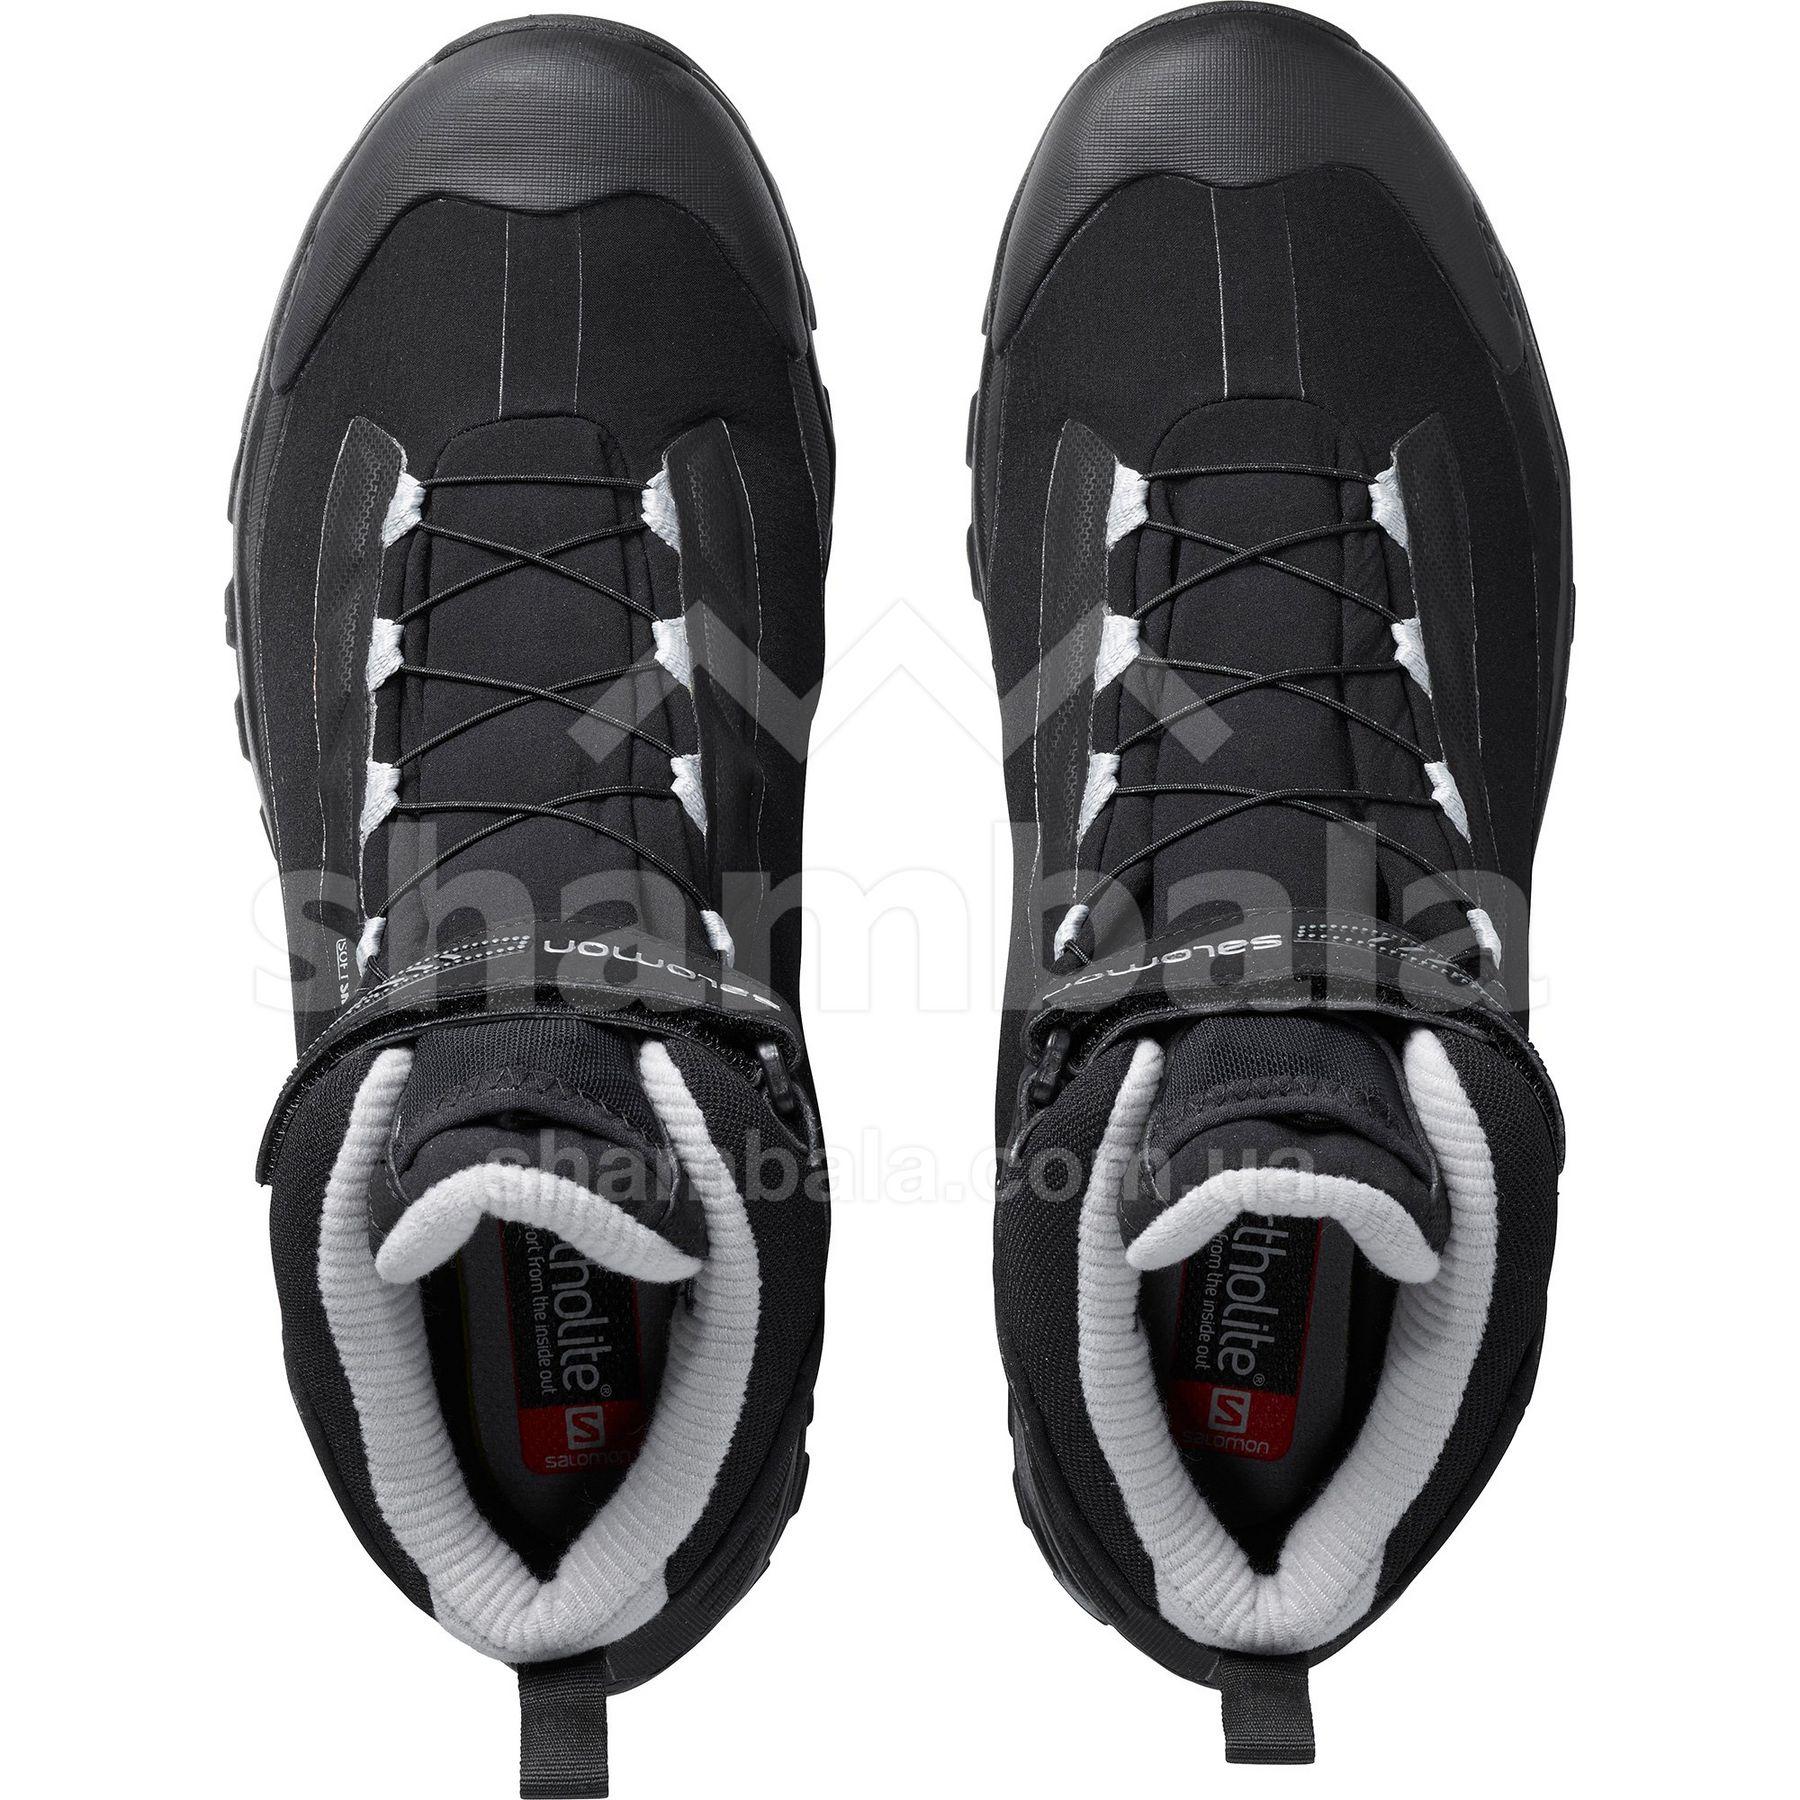 f33796a0 Ботинки мужские Salomon - Deemax 3 TS WP Black/Black, р.41 1/3 (SLM DEEMAX .376878-7,5)